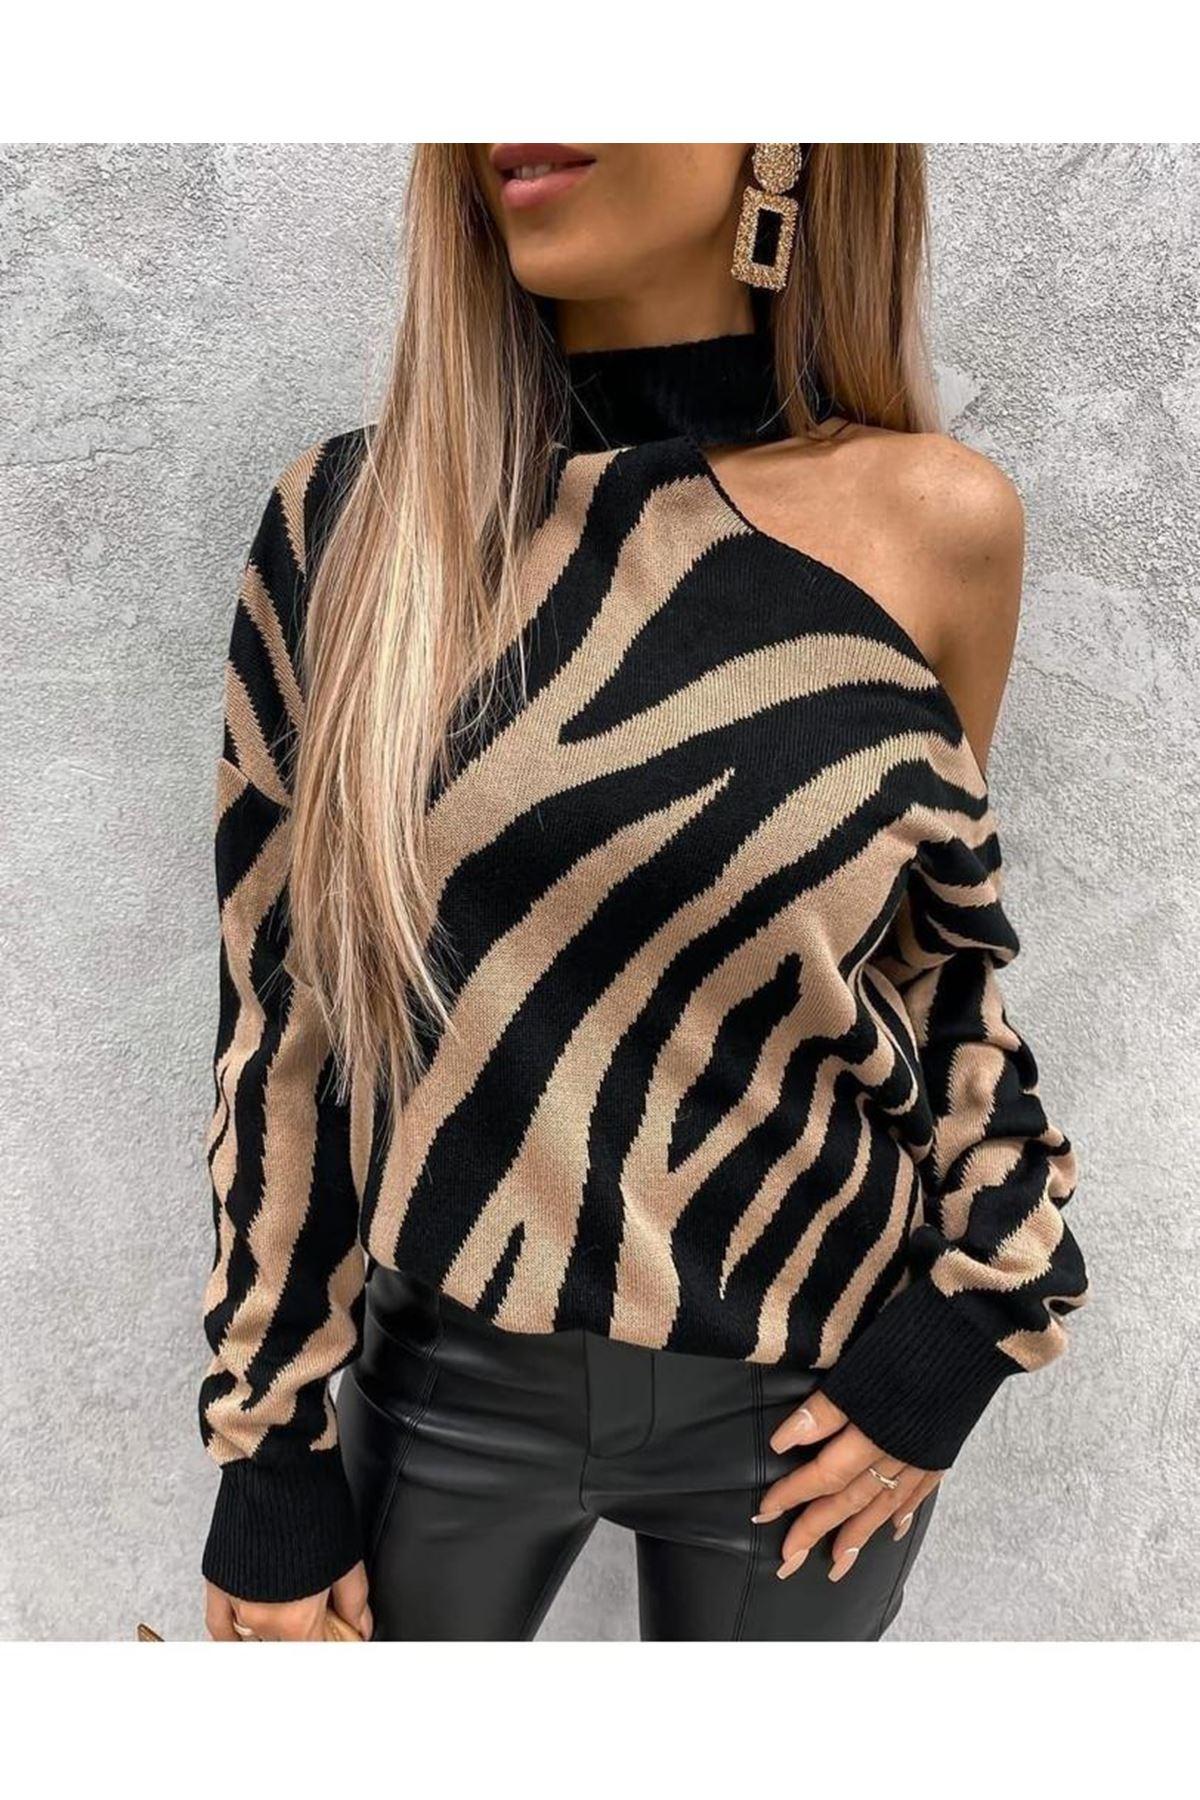 Zebra Desen Tek Omuz Bluz - Siyah